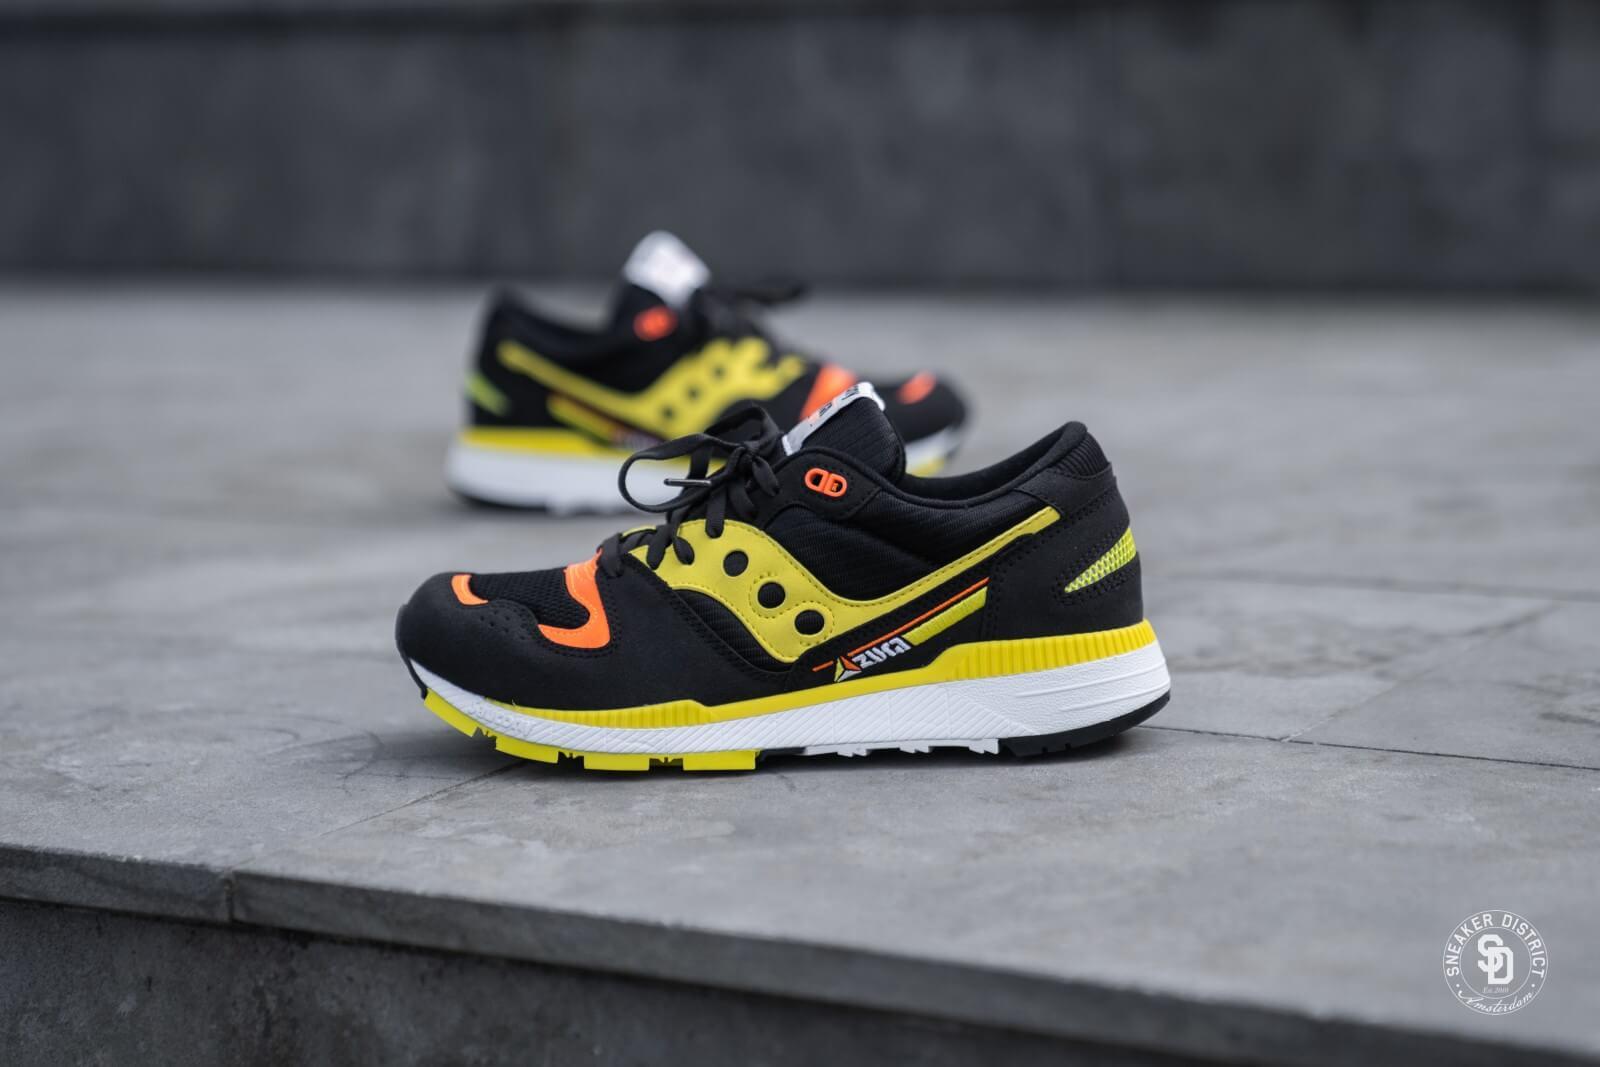 Saucony Azura BlackYellowOrange (S70437 3) | Shoes  Men's